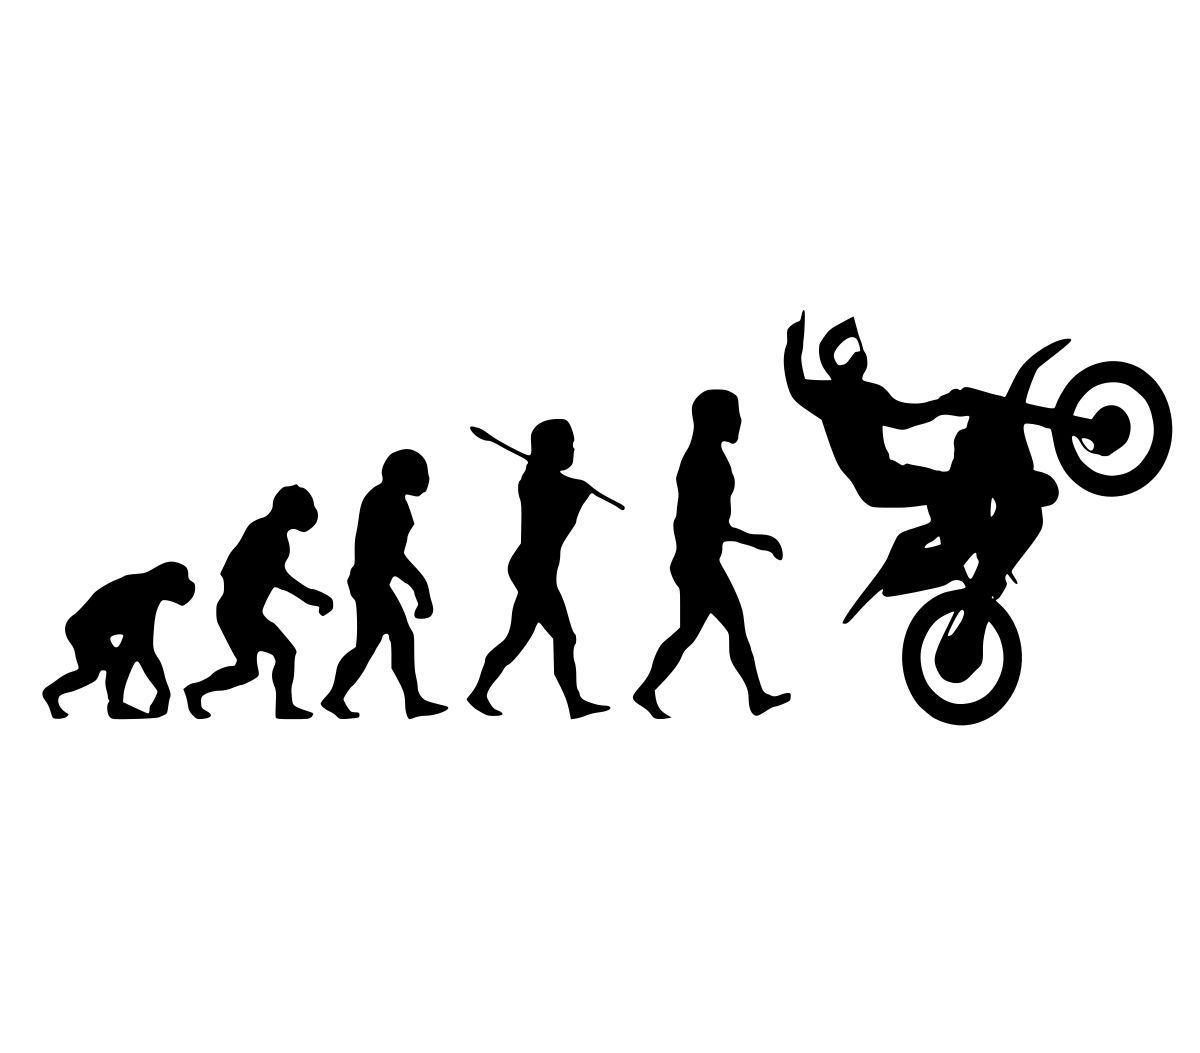 Motocross Sticker Motocross Stickers Honda Dirt Bike Bike Stickers